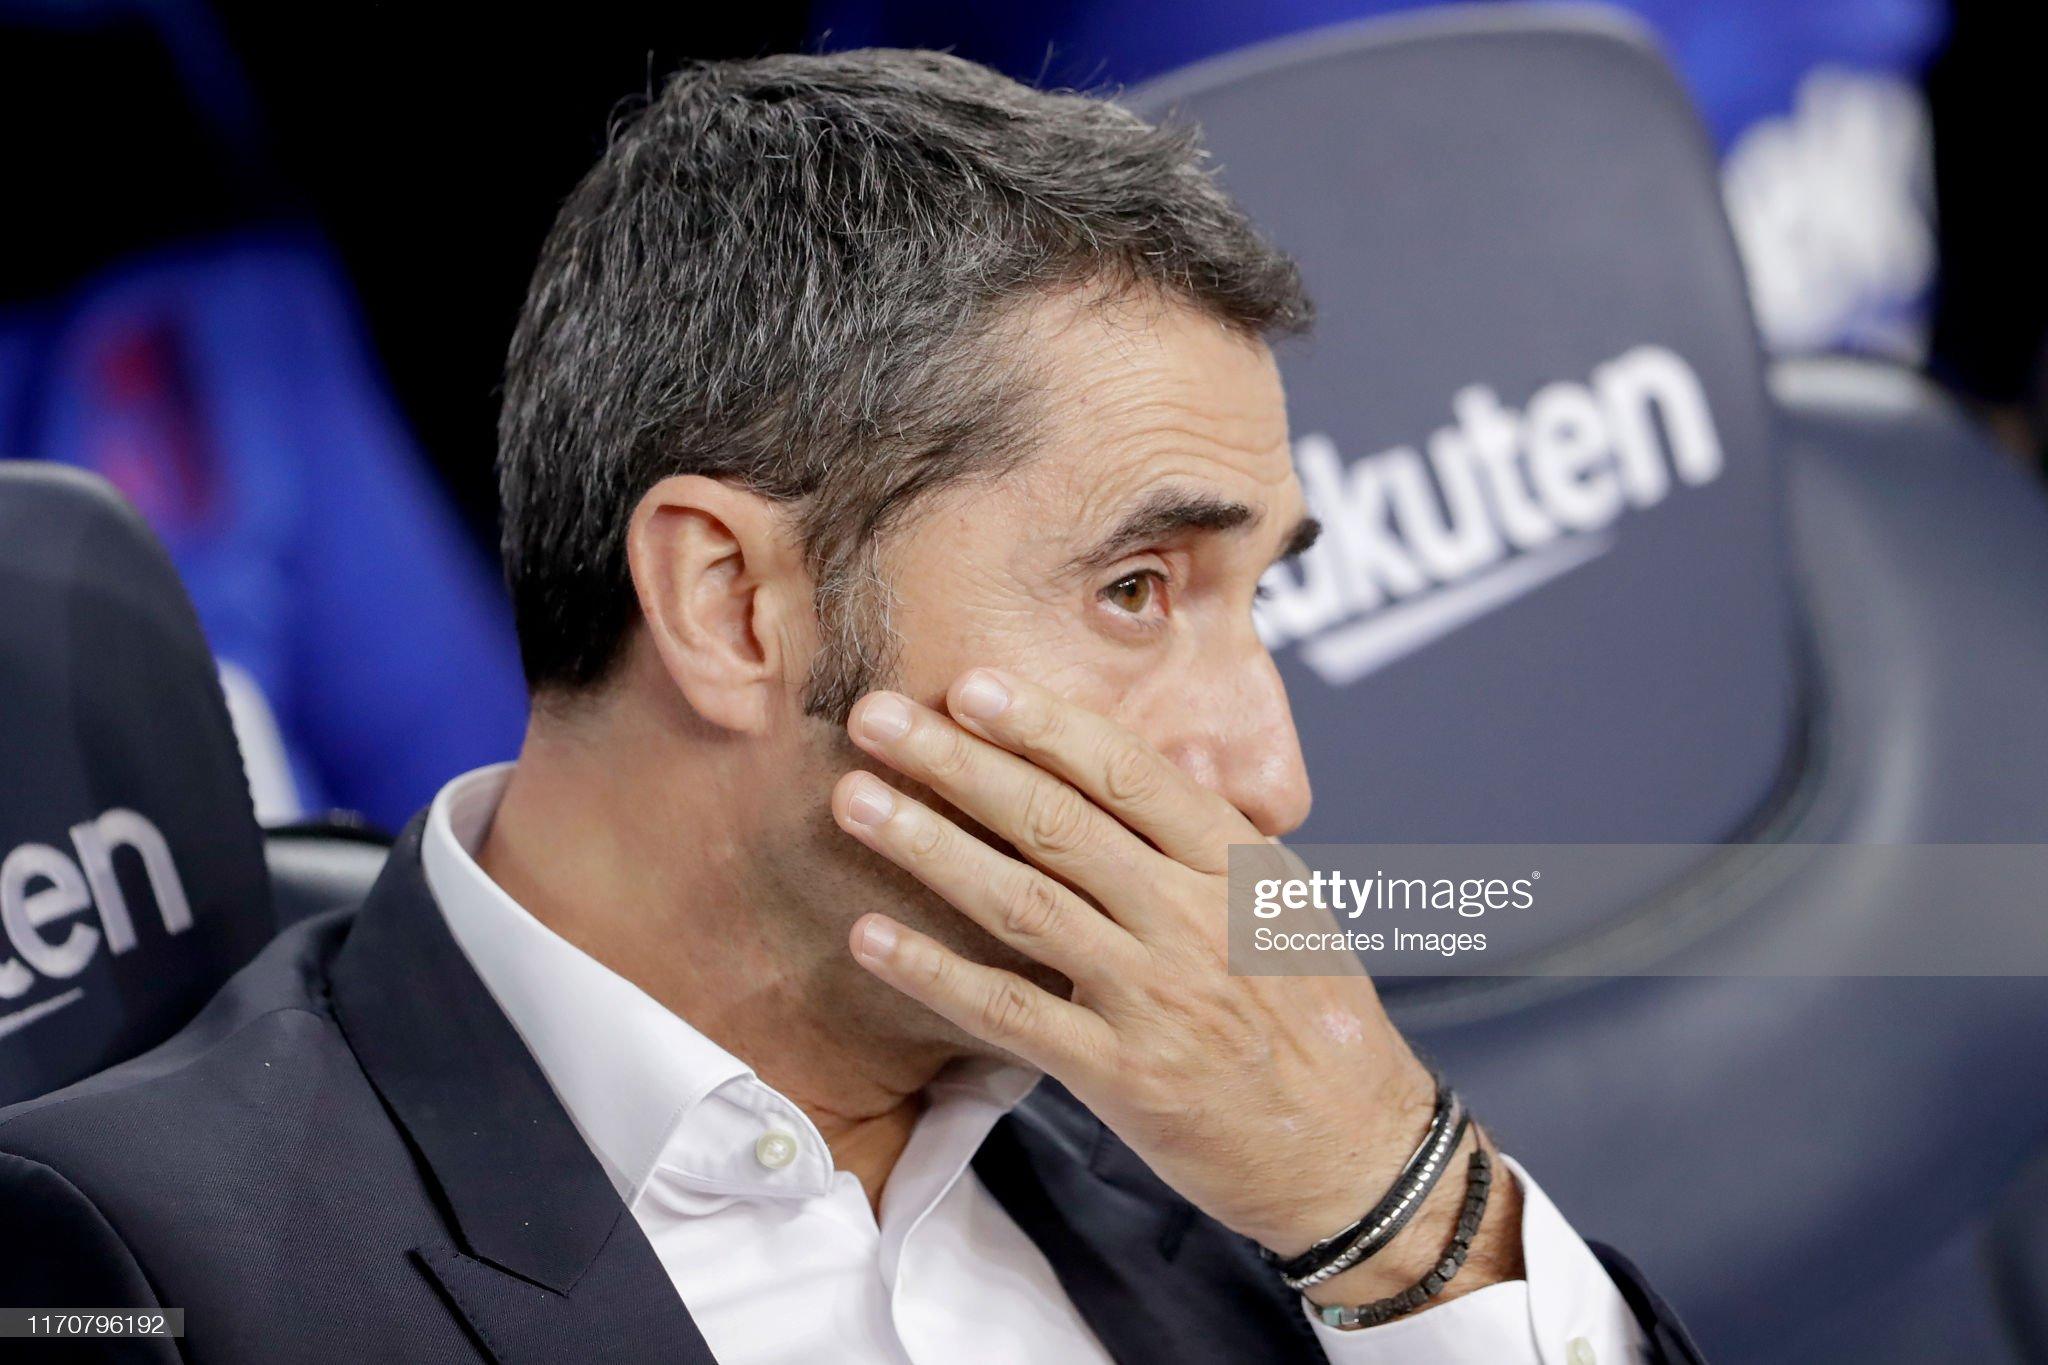 صور مباراة : برشلونة - فياريال 2-1 ( 24-09-2019 )  Coach-ernesto-valverde-of-fc-barcelona-during-the-la-liga-santander-picture-id1170796192?s=2048x2048